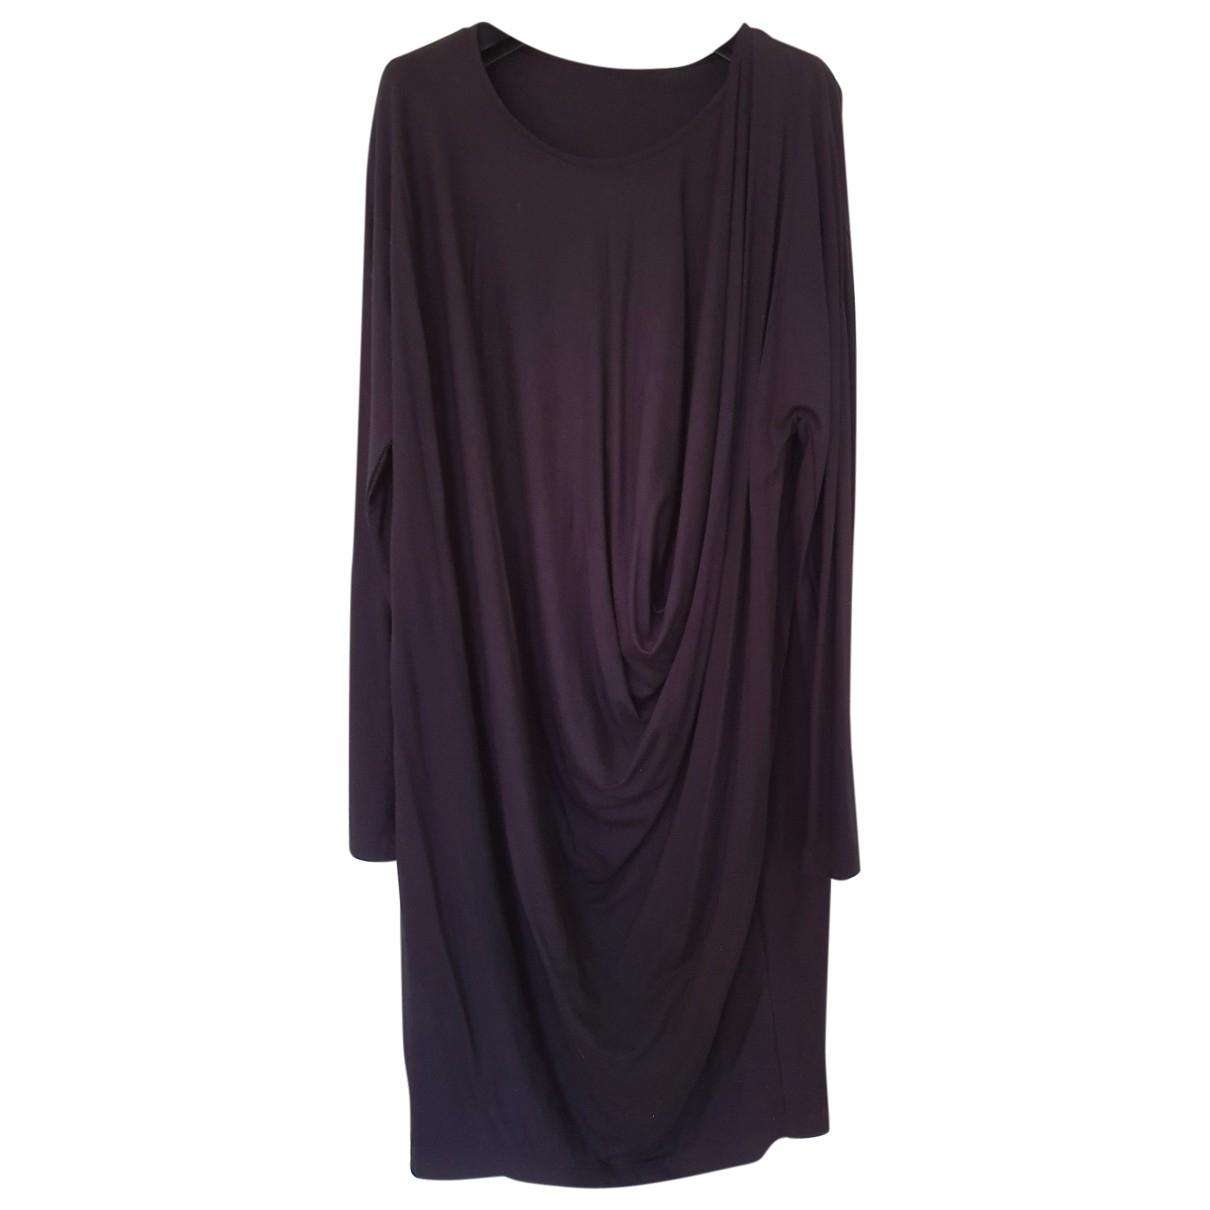 Cos \N Black Cotton dress for Women 38 FR